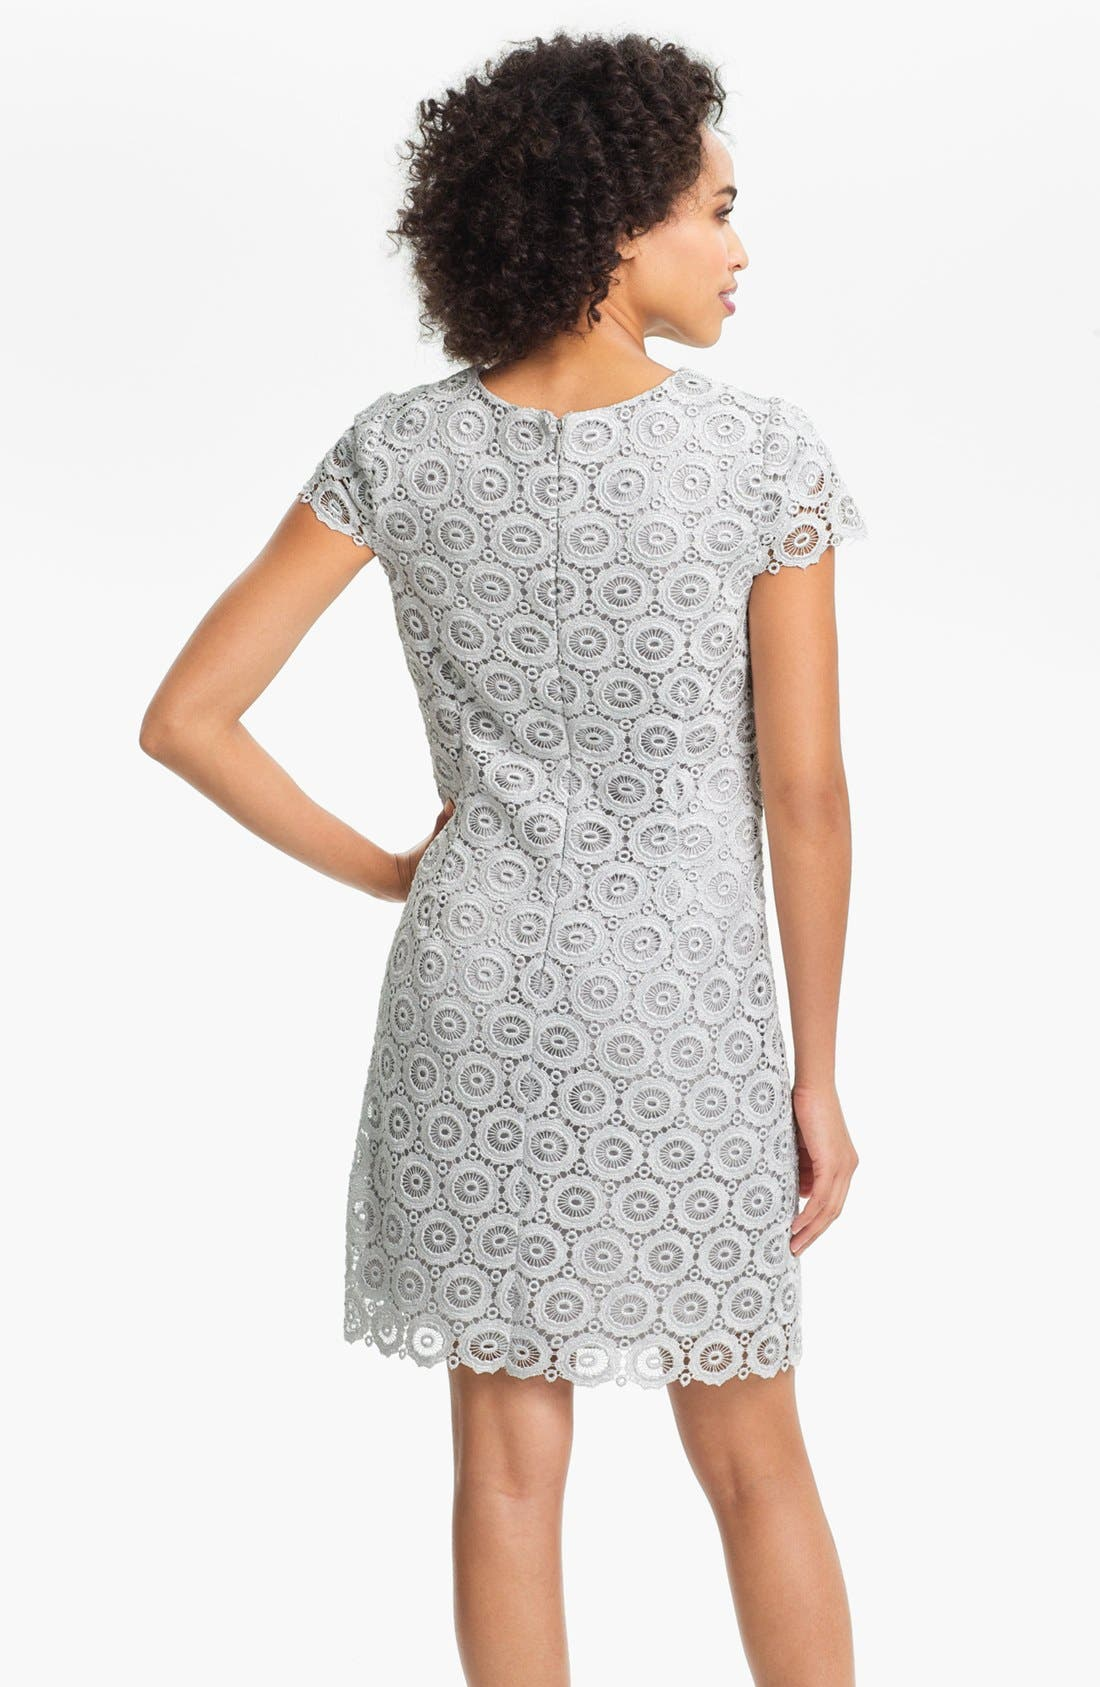 Alternate Image 2  - Suzi Chin for Maggy Boutique Lace Shift Dress (Petite)